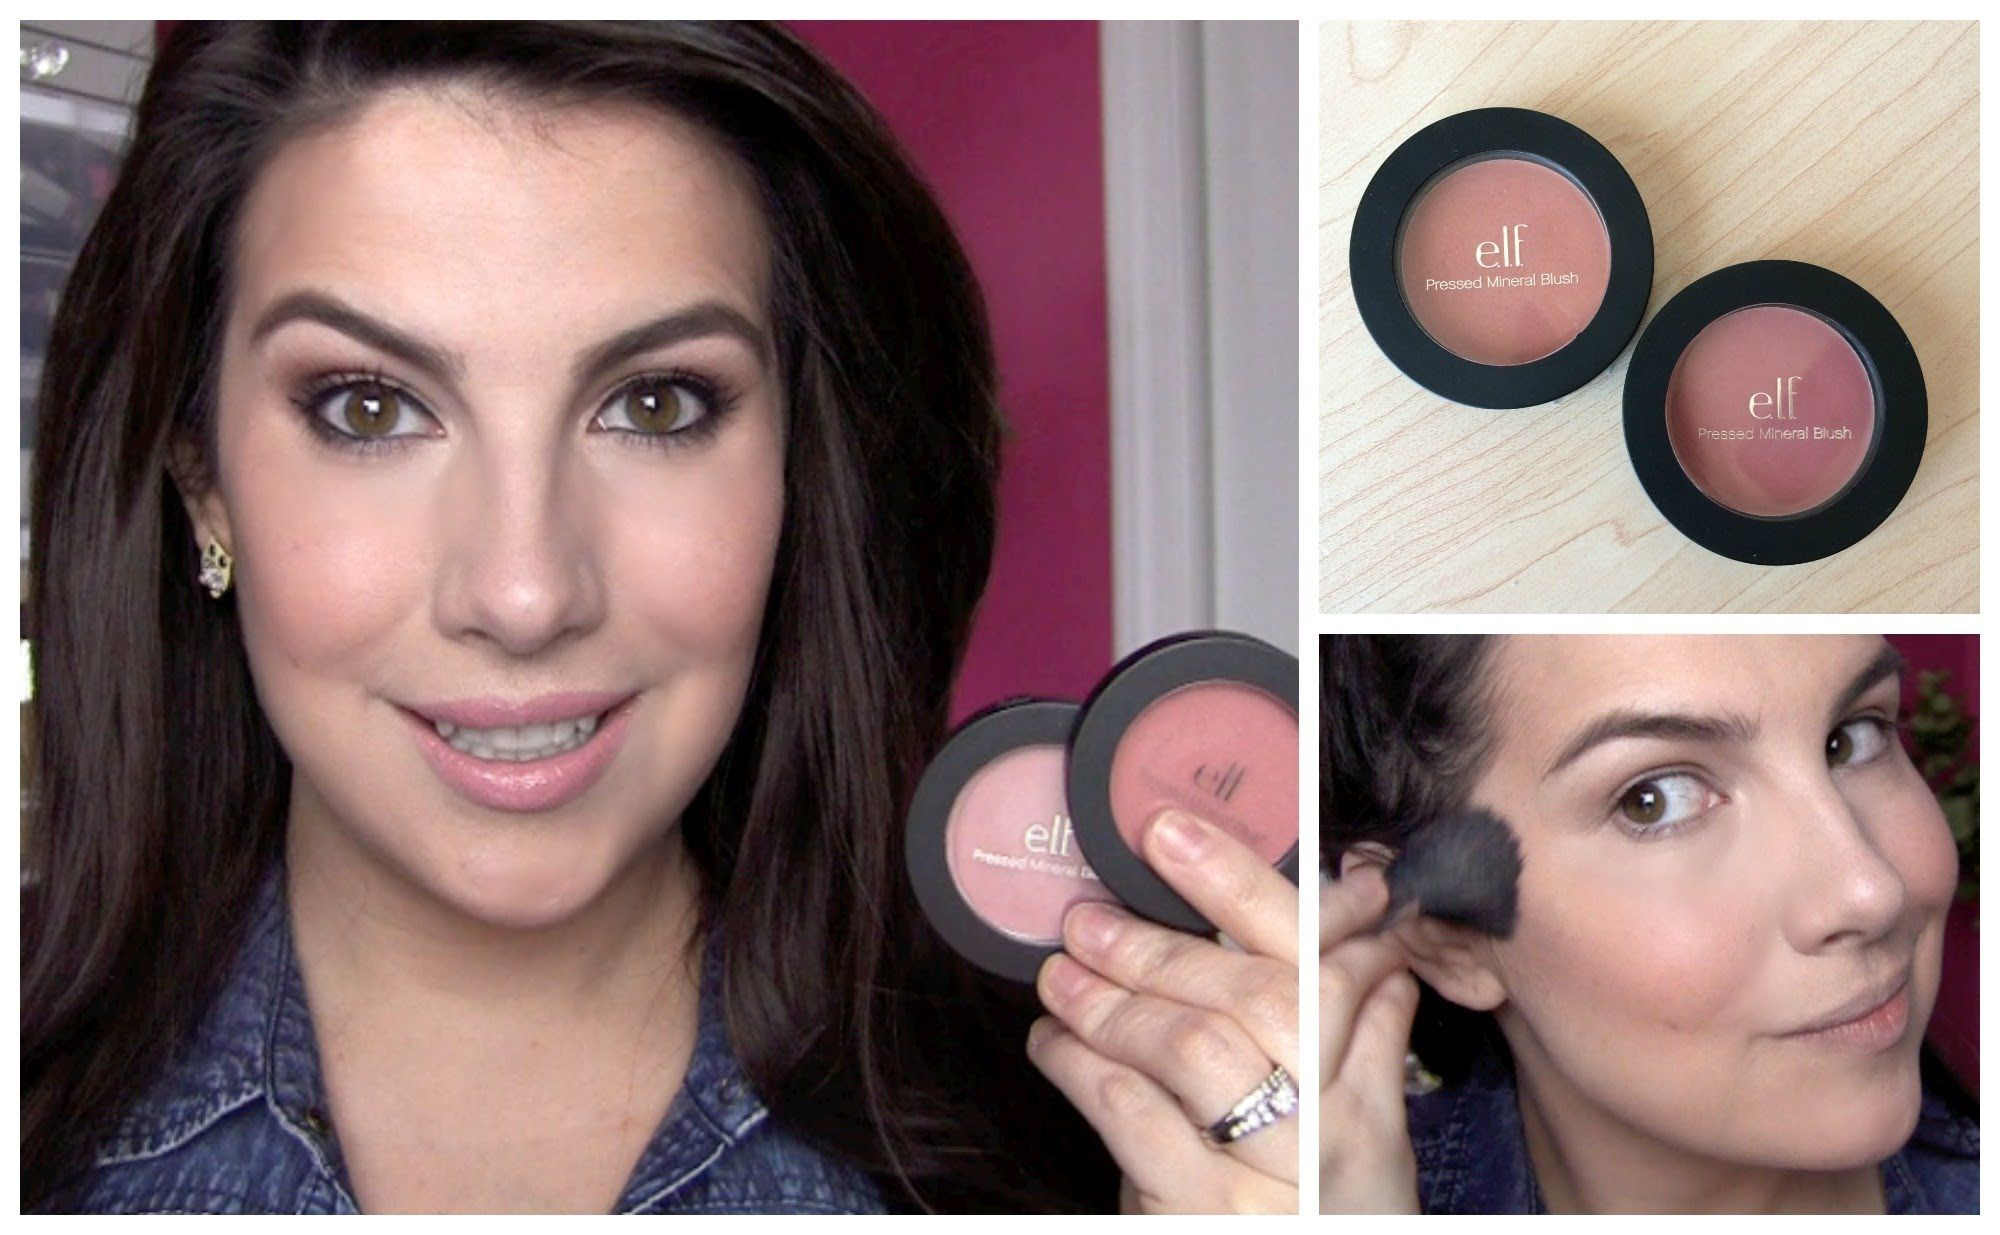 ELF Pressed Mineral Blush Review Makeup reviews, Makeup